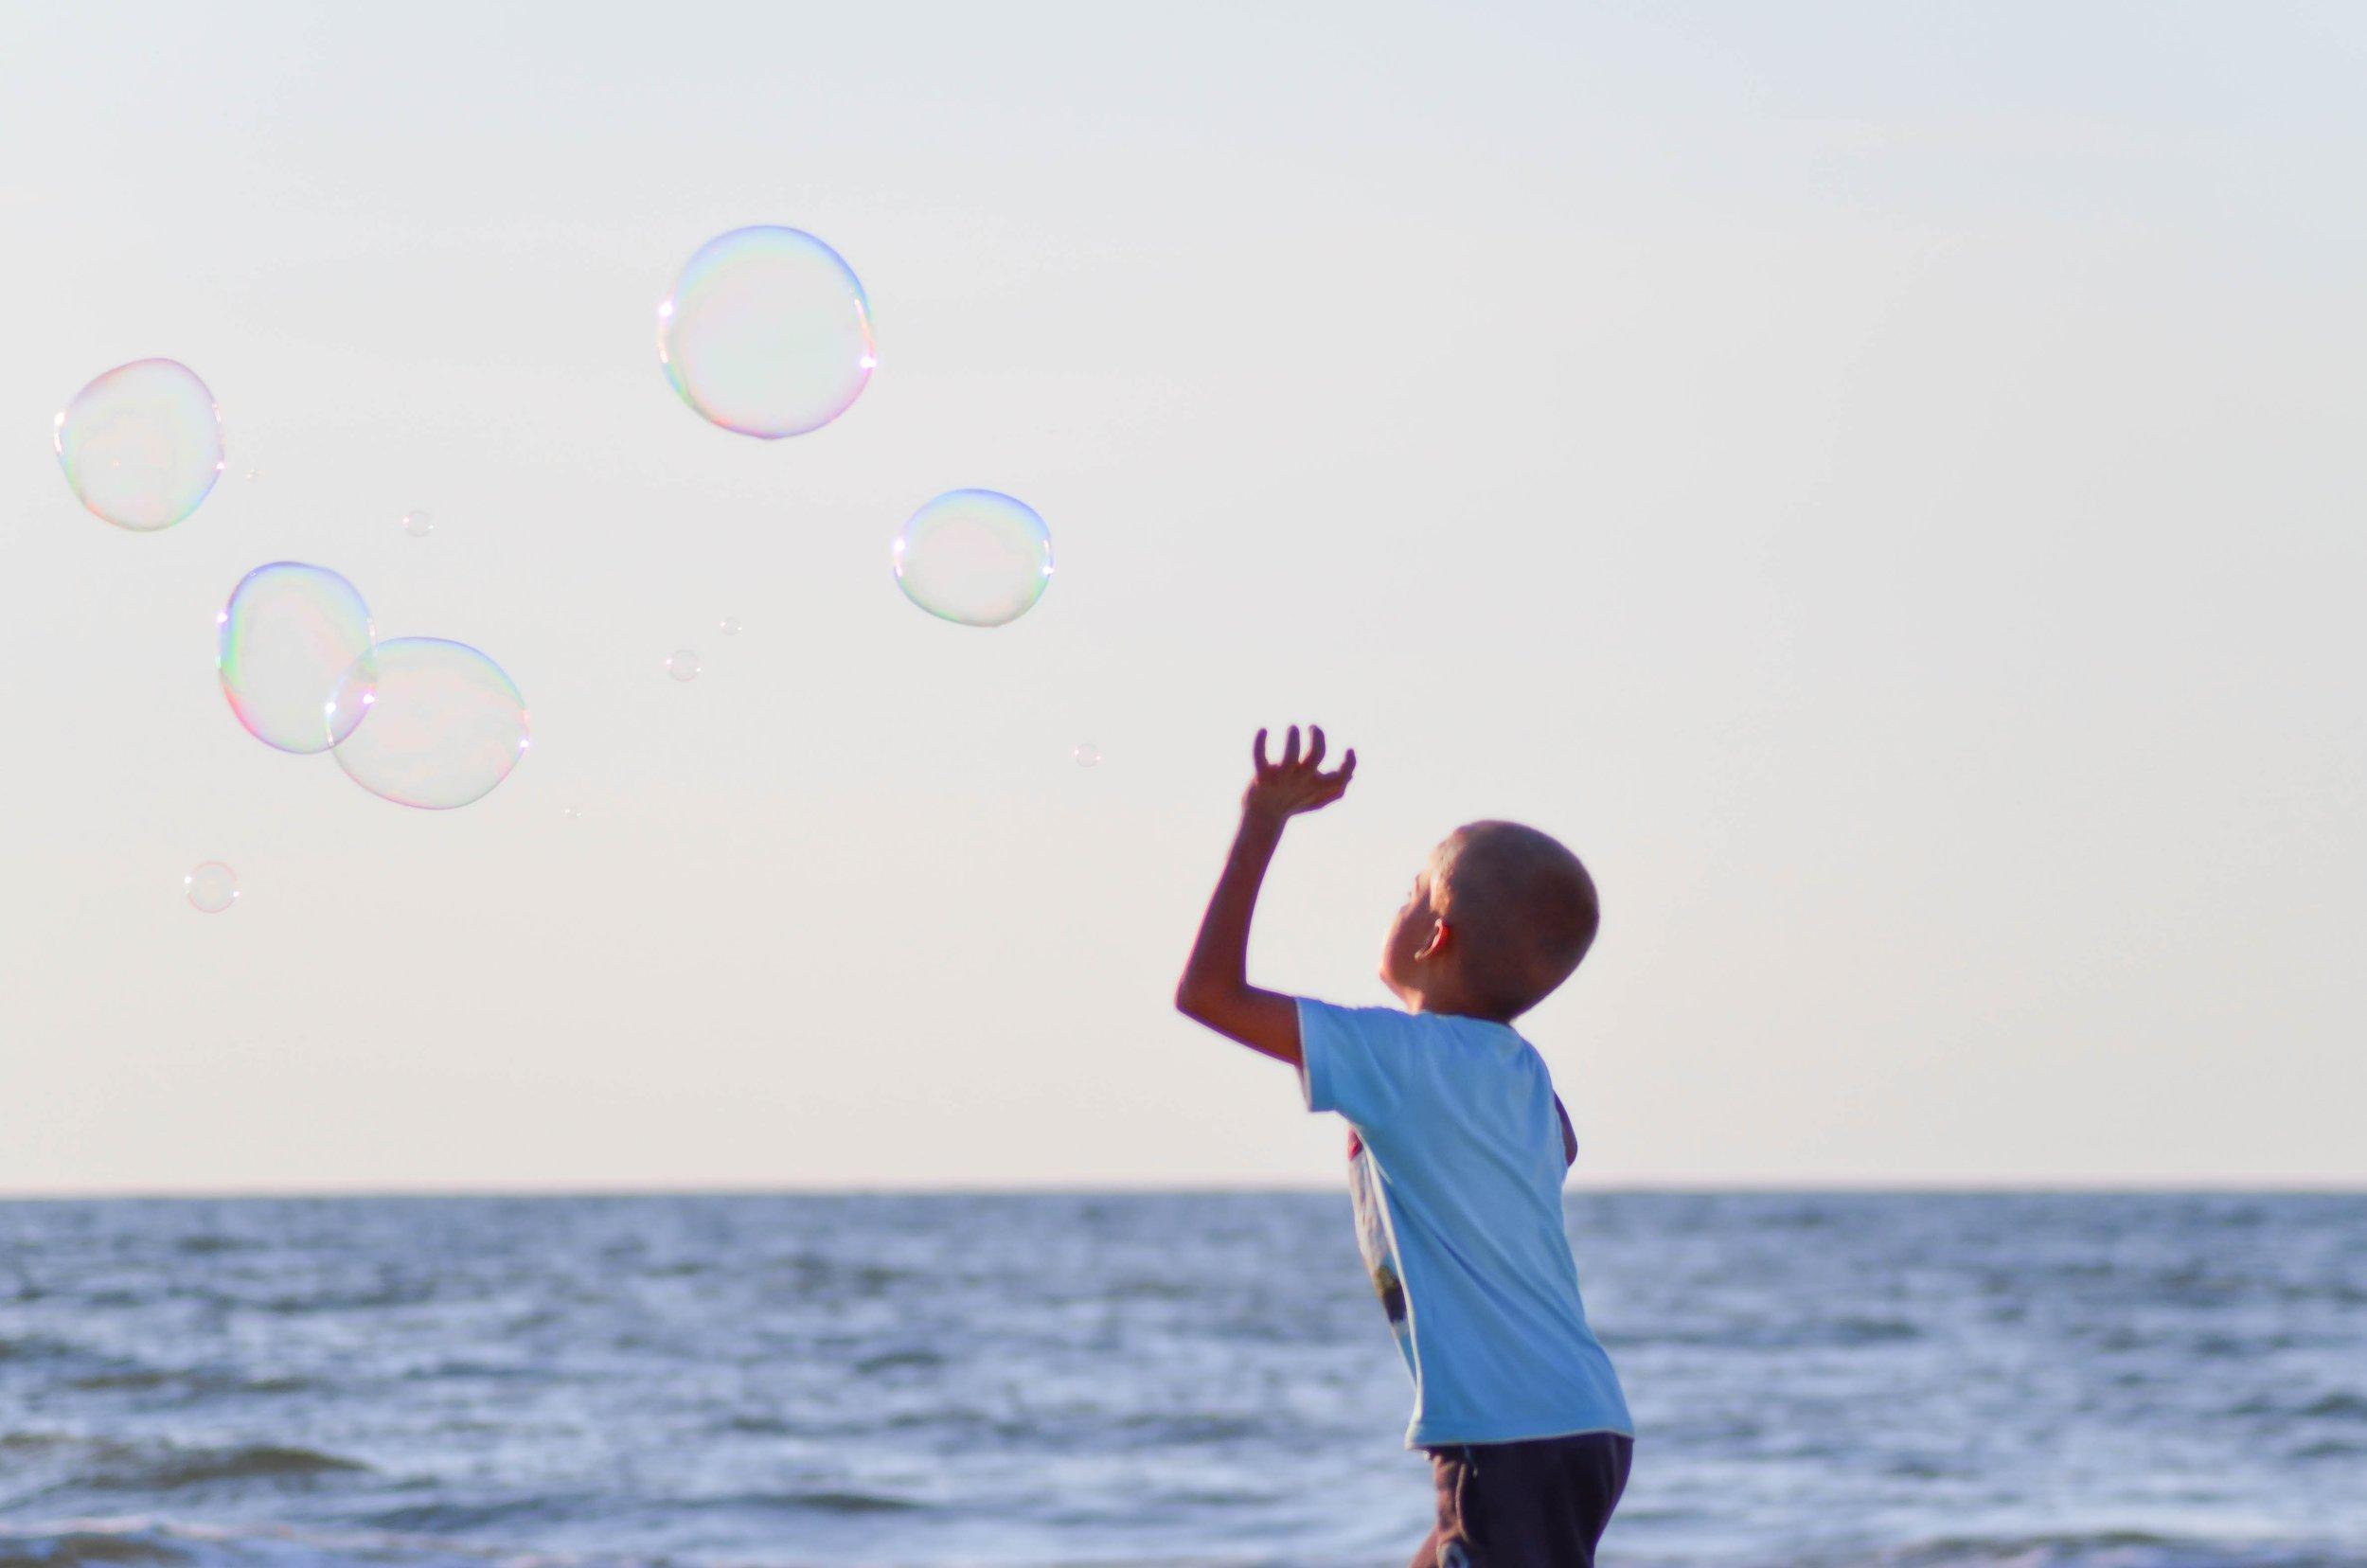 beach-boy-bubbles-106684.jpg